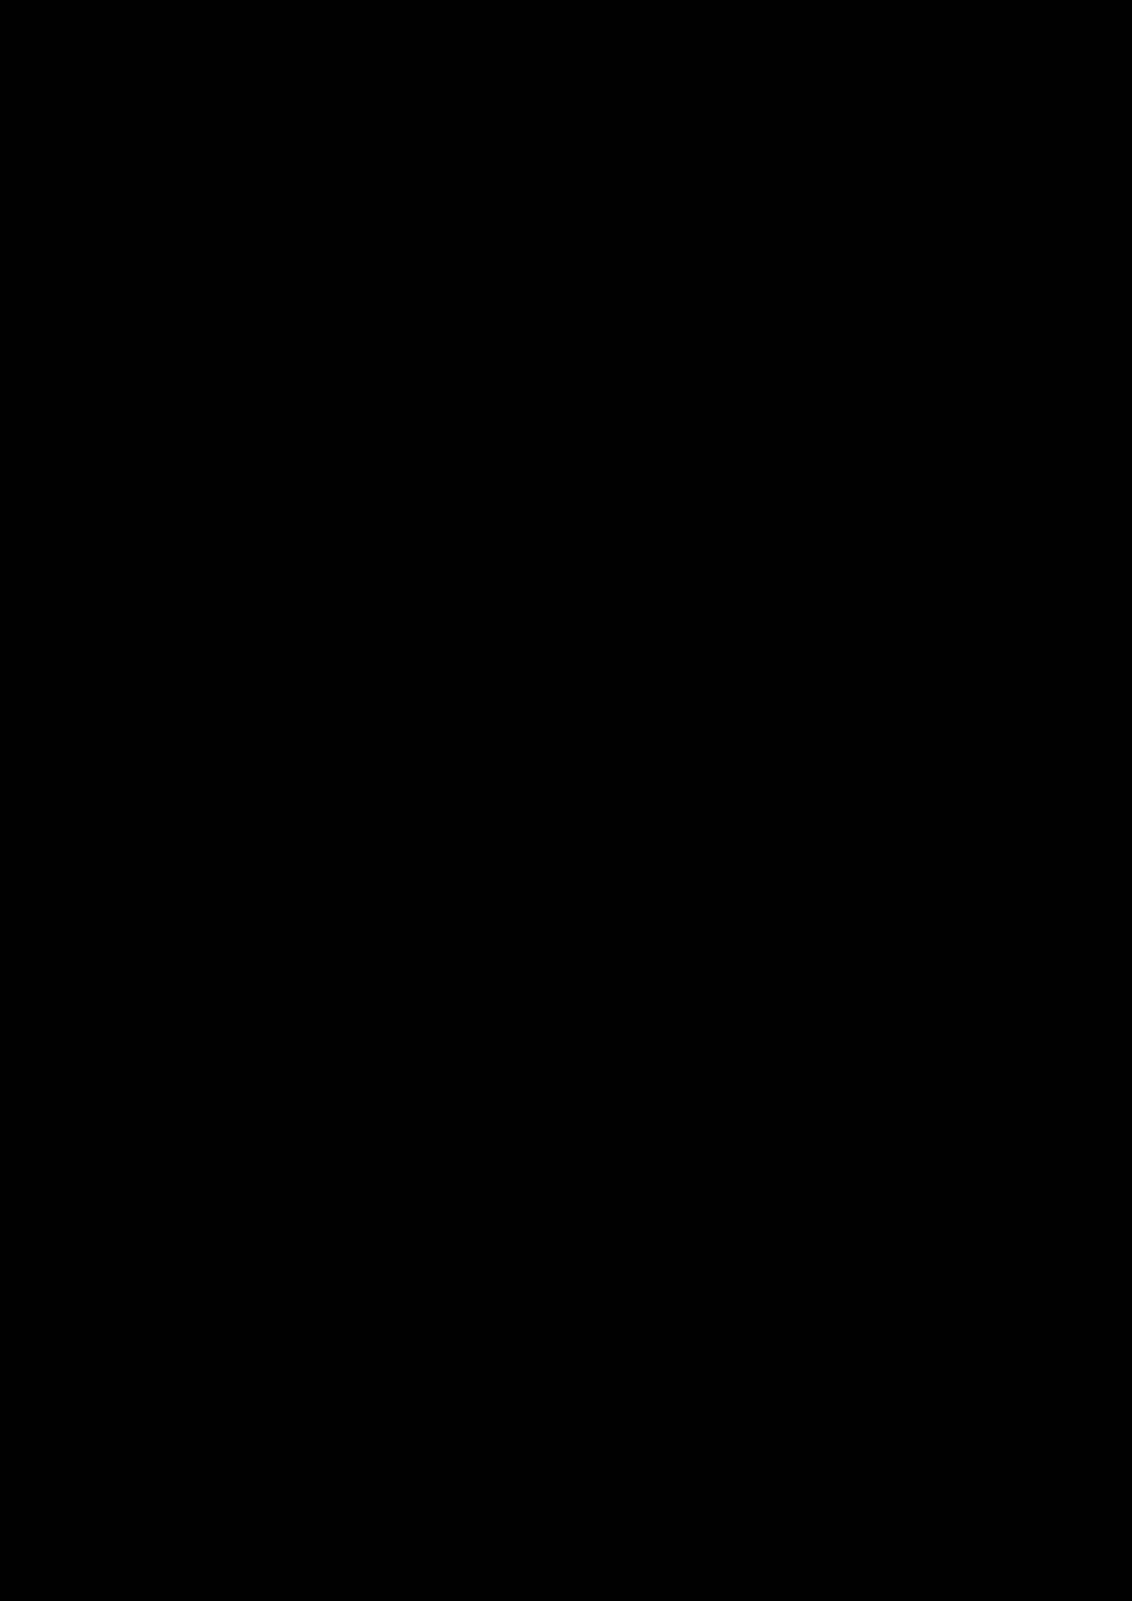 Belyiy sokol slide, Image 63